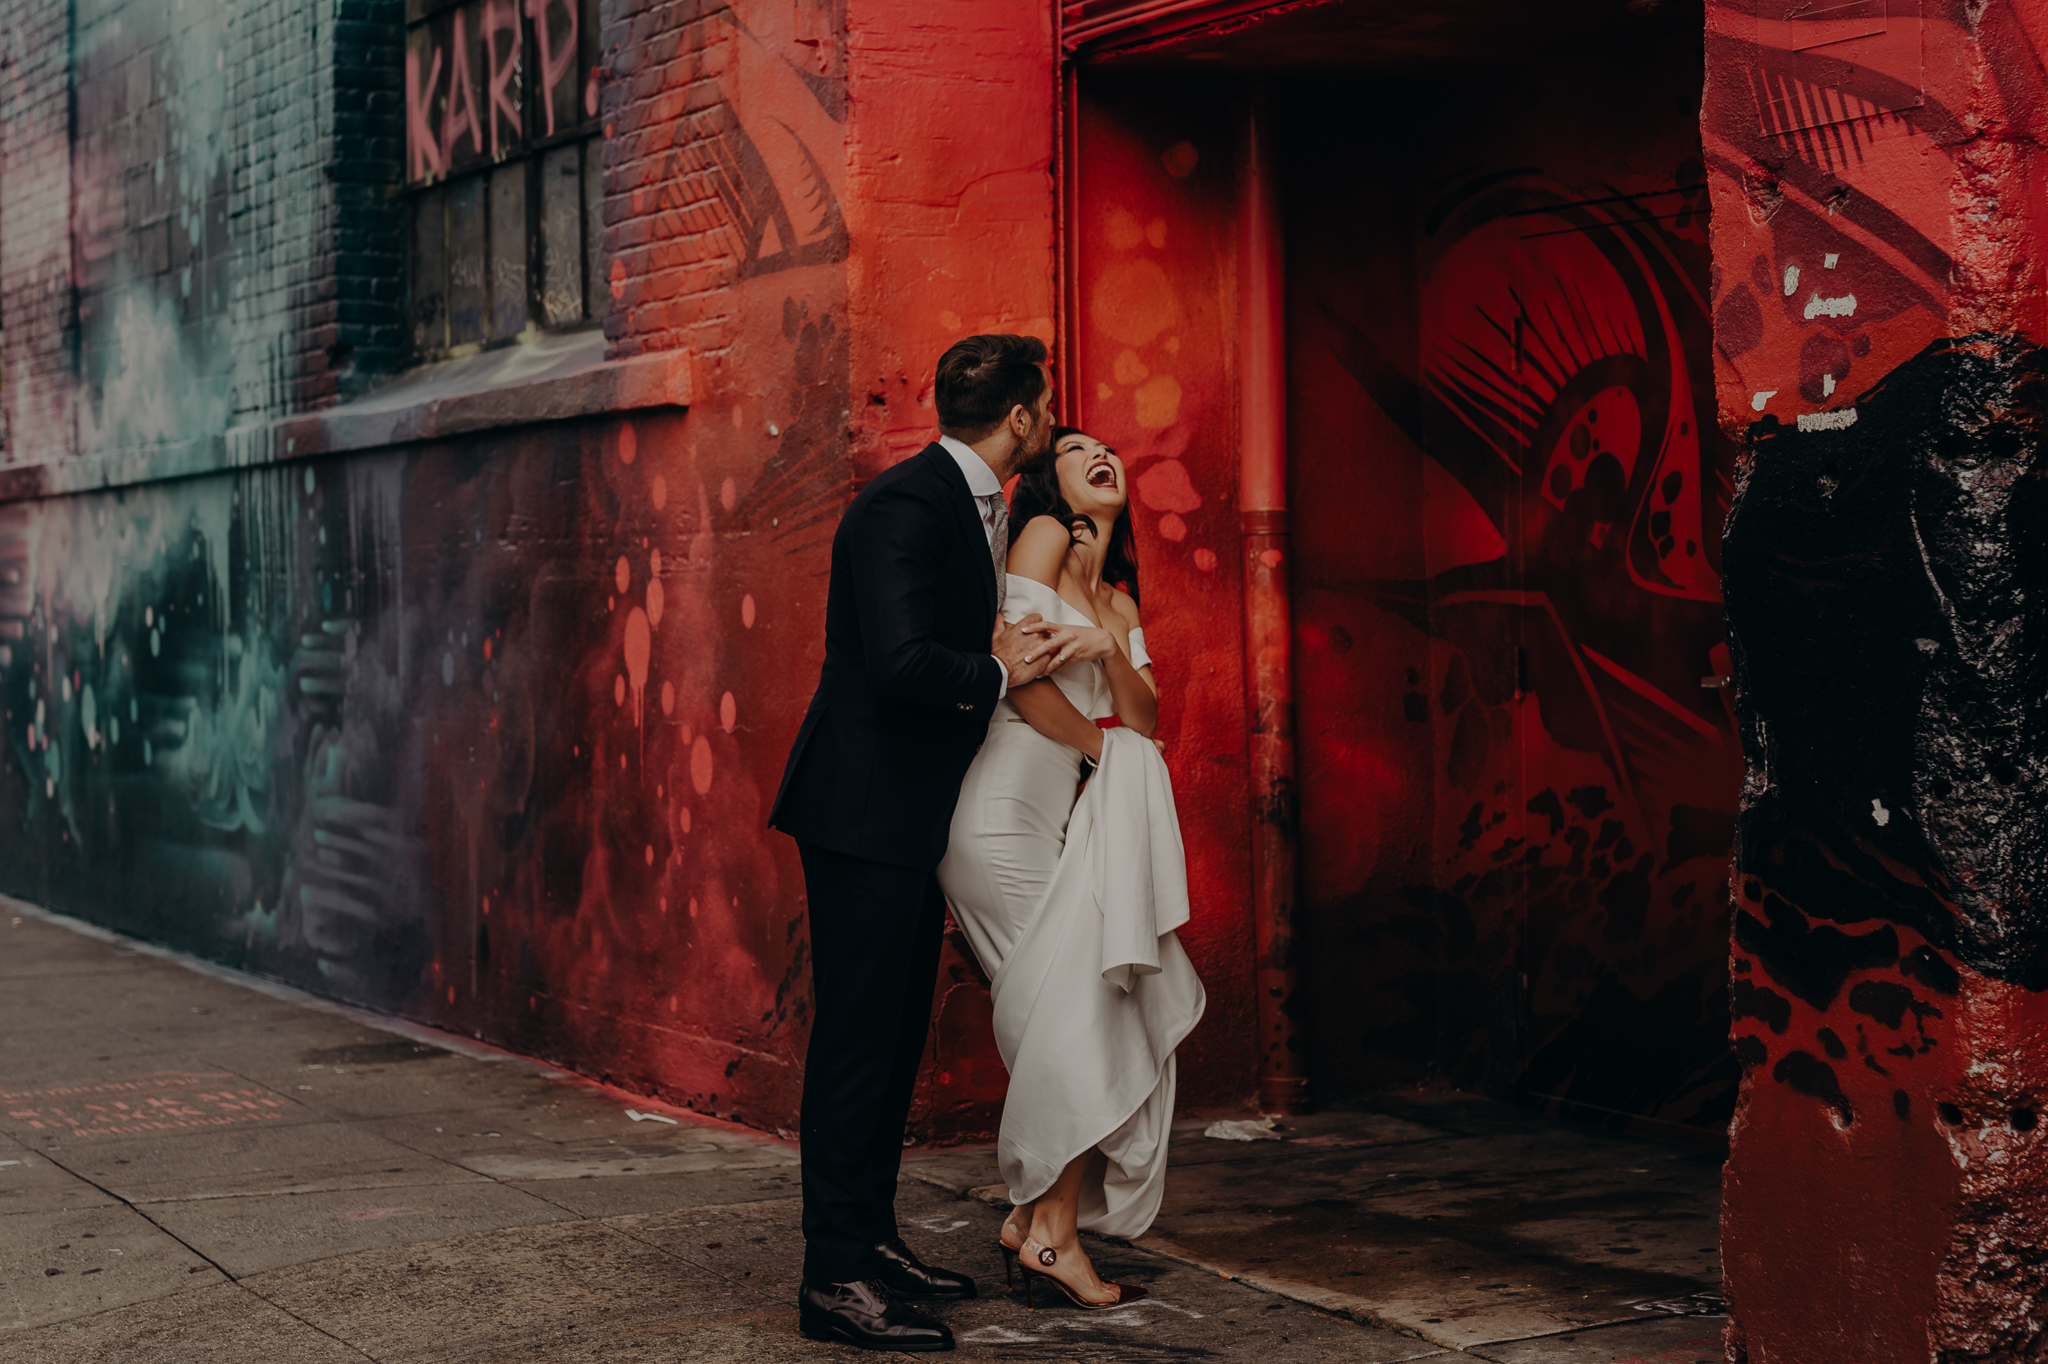 Wedding Photo LA - wedding photographer in los angeles - millwick wedding venue -isaiahandtaylor.com-084.jpg